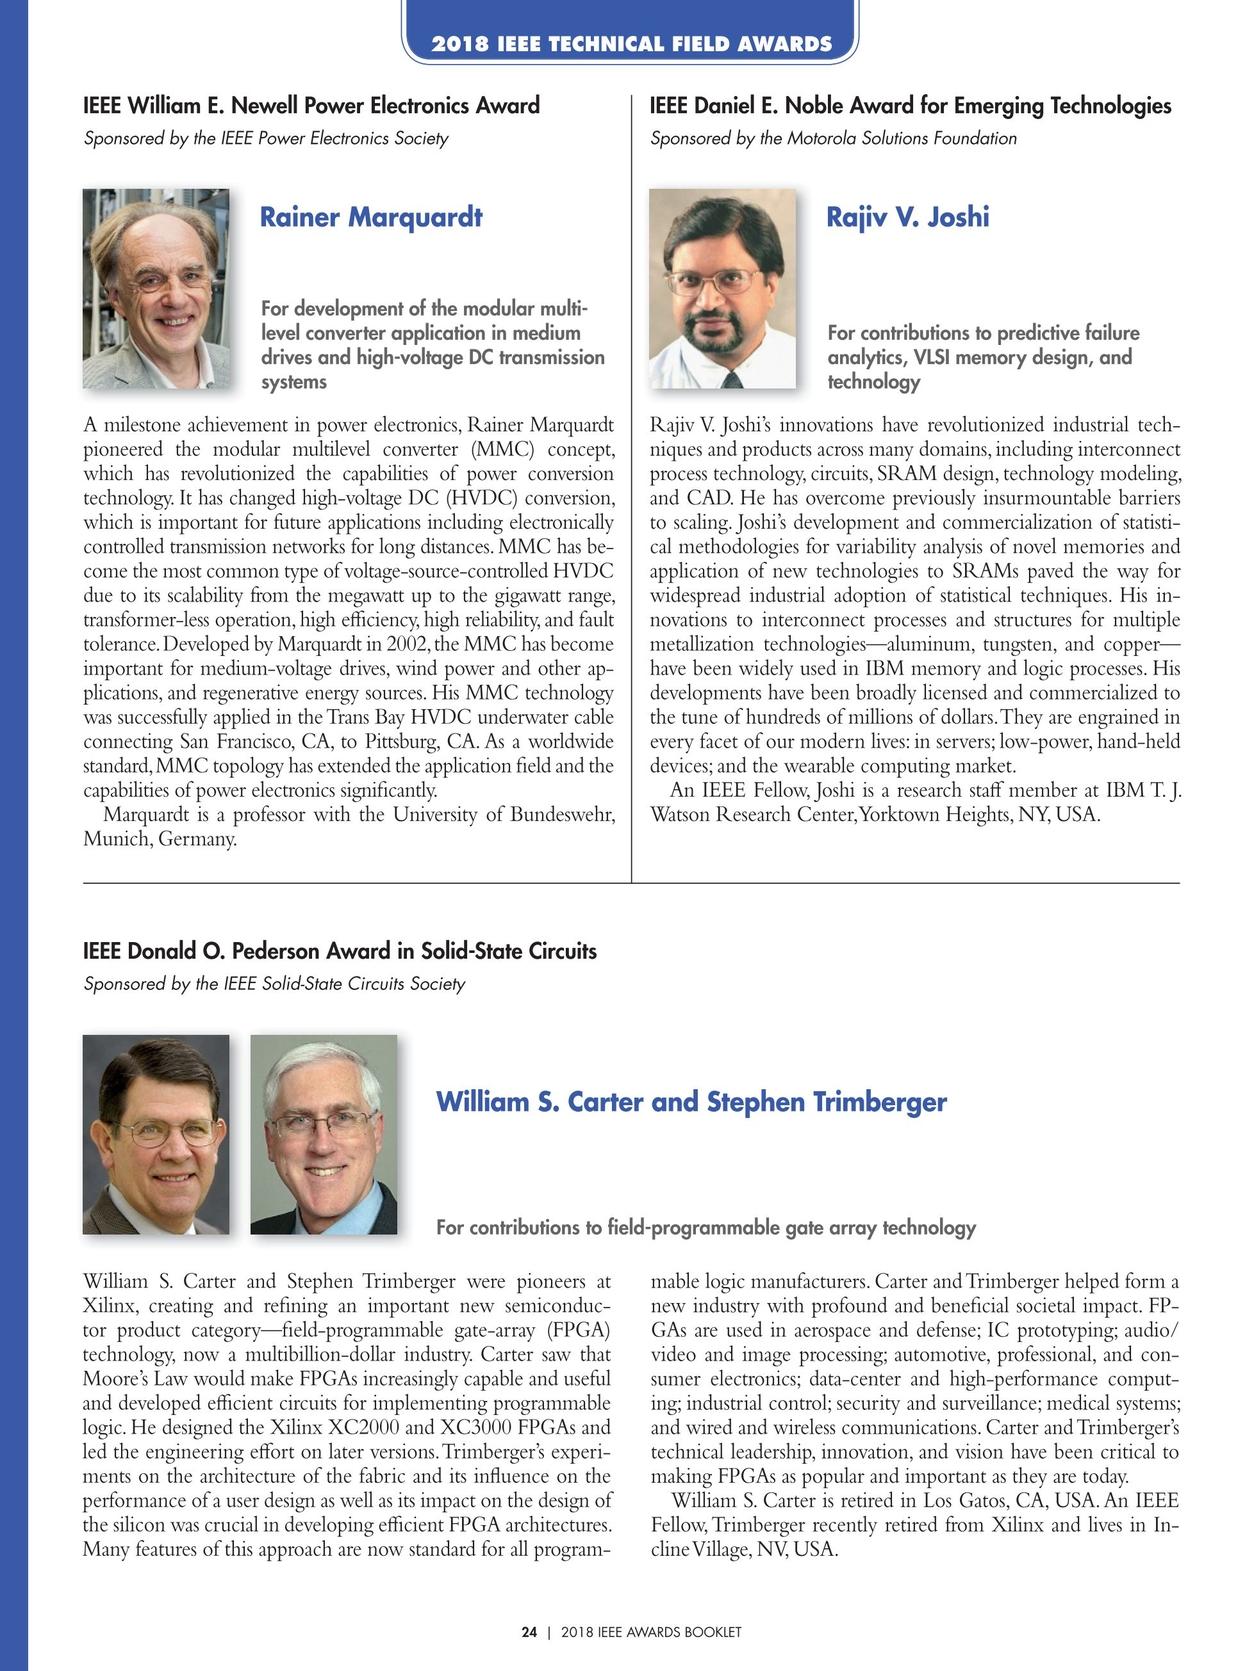 IEEE Awards Booklet - 2018